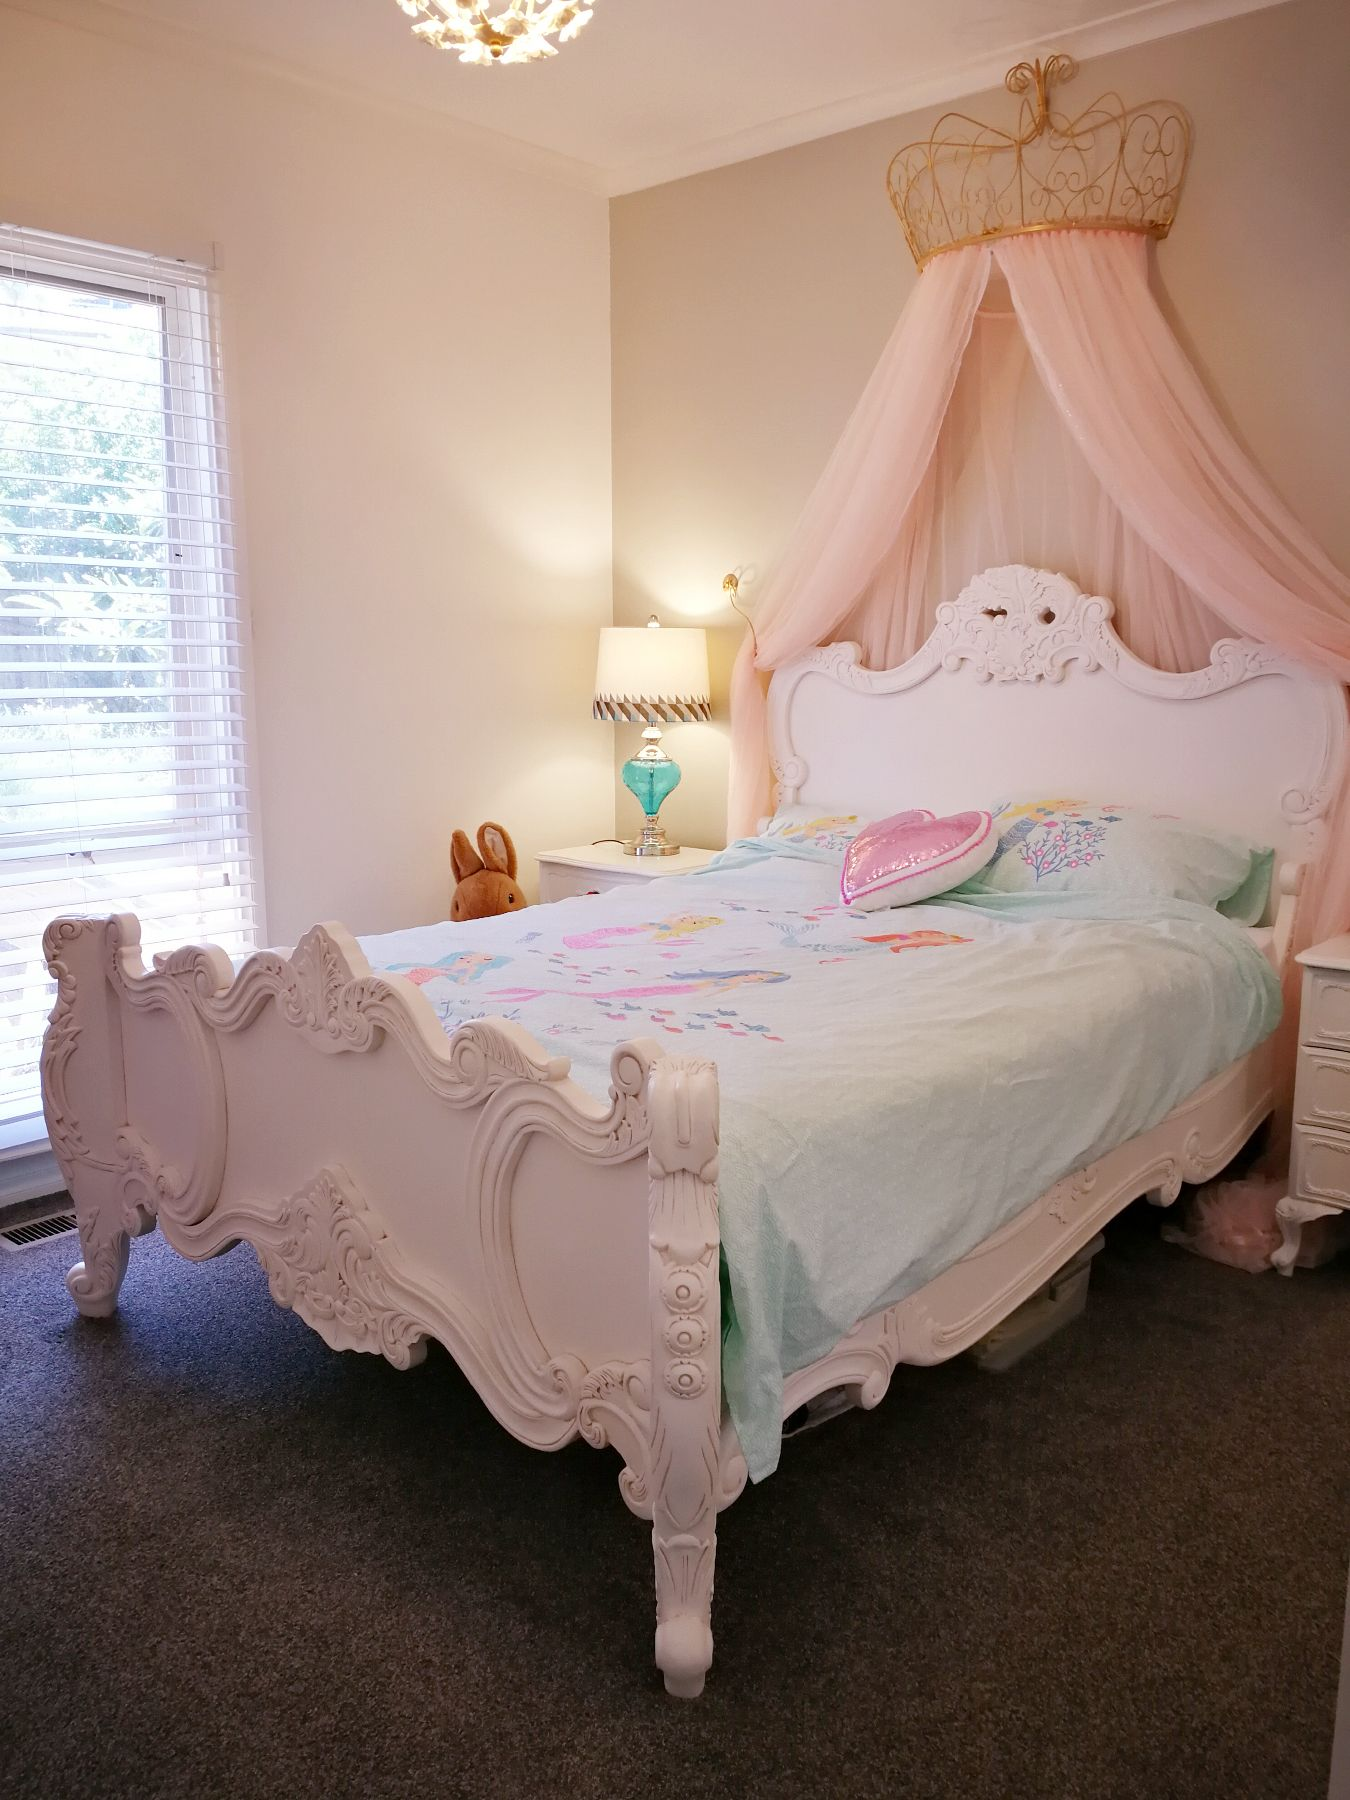 Kids Princess Canopy Bed & Kids Princess Canopy Bed | Princess Bedroom | Pinterest | Princess ...